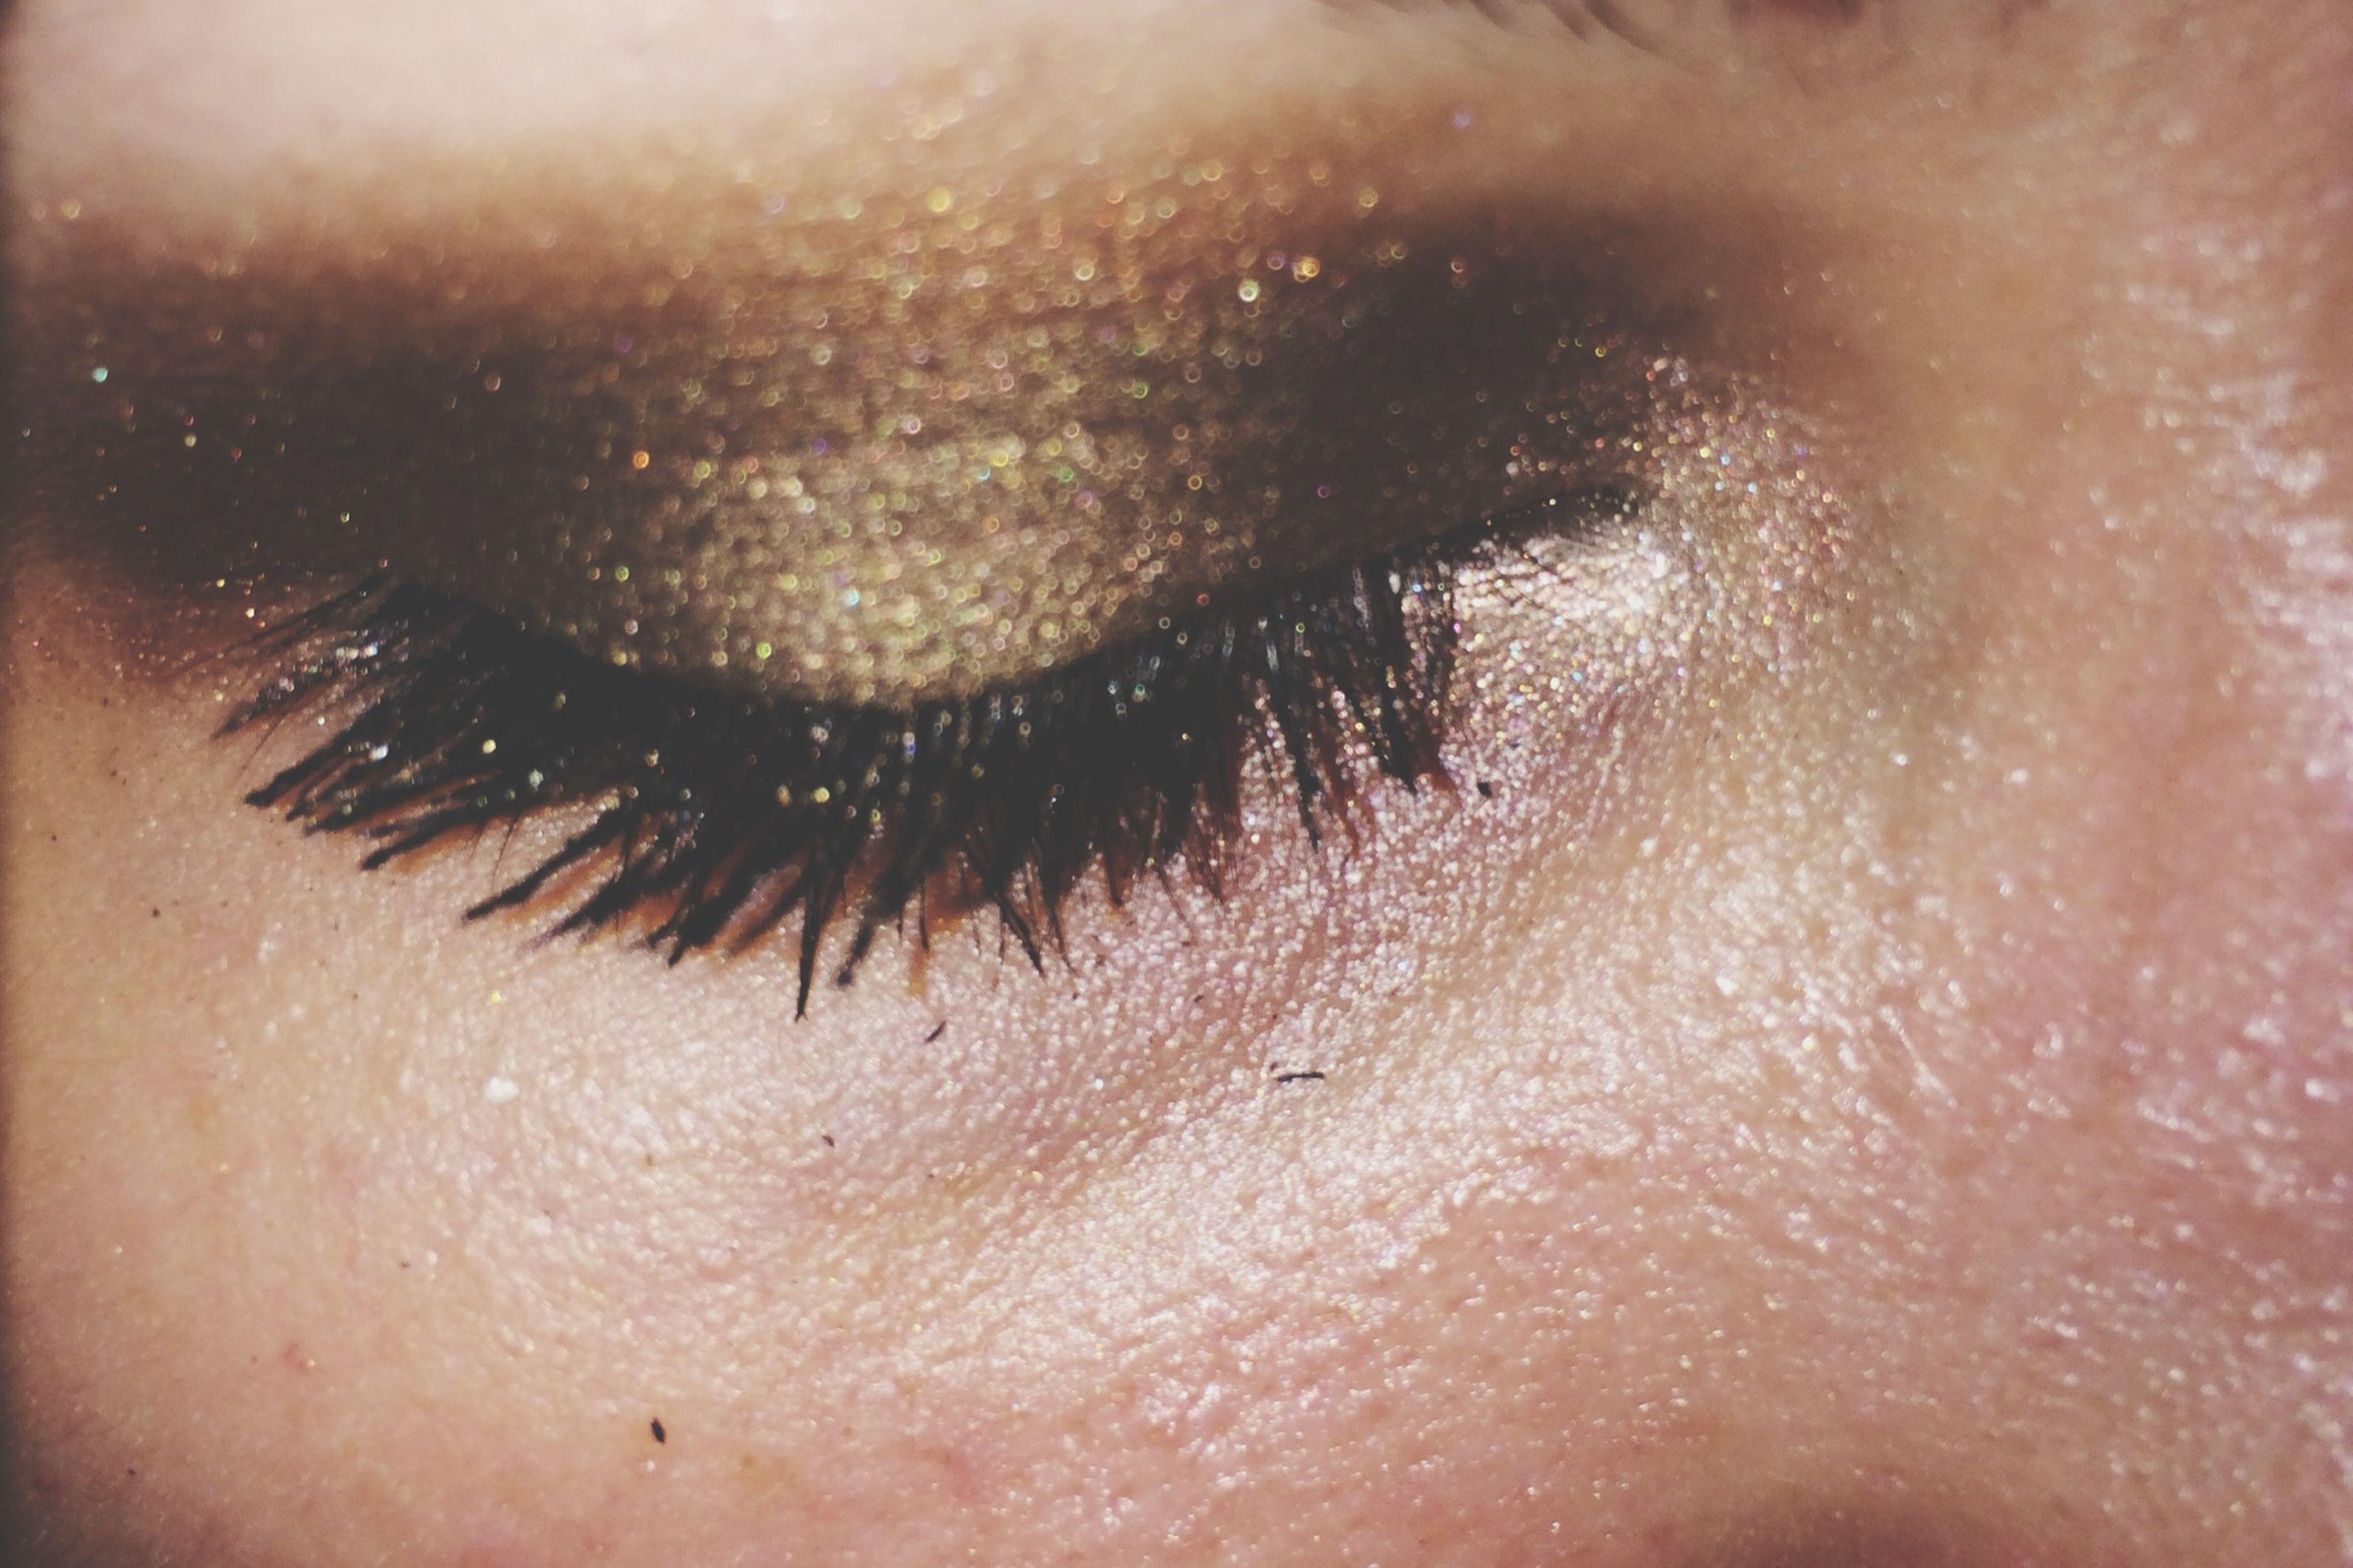 close-up, part of, full frame, extreme close-up, backgrounds, sensory perception, extreme close up, human eye, macro, person, eyelash, indoors, unrecognizable person, human skin, detail, eyesight